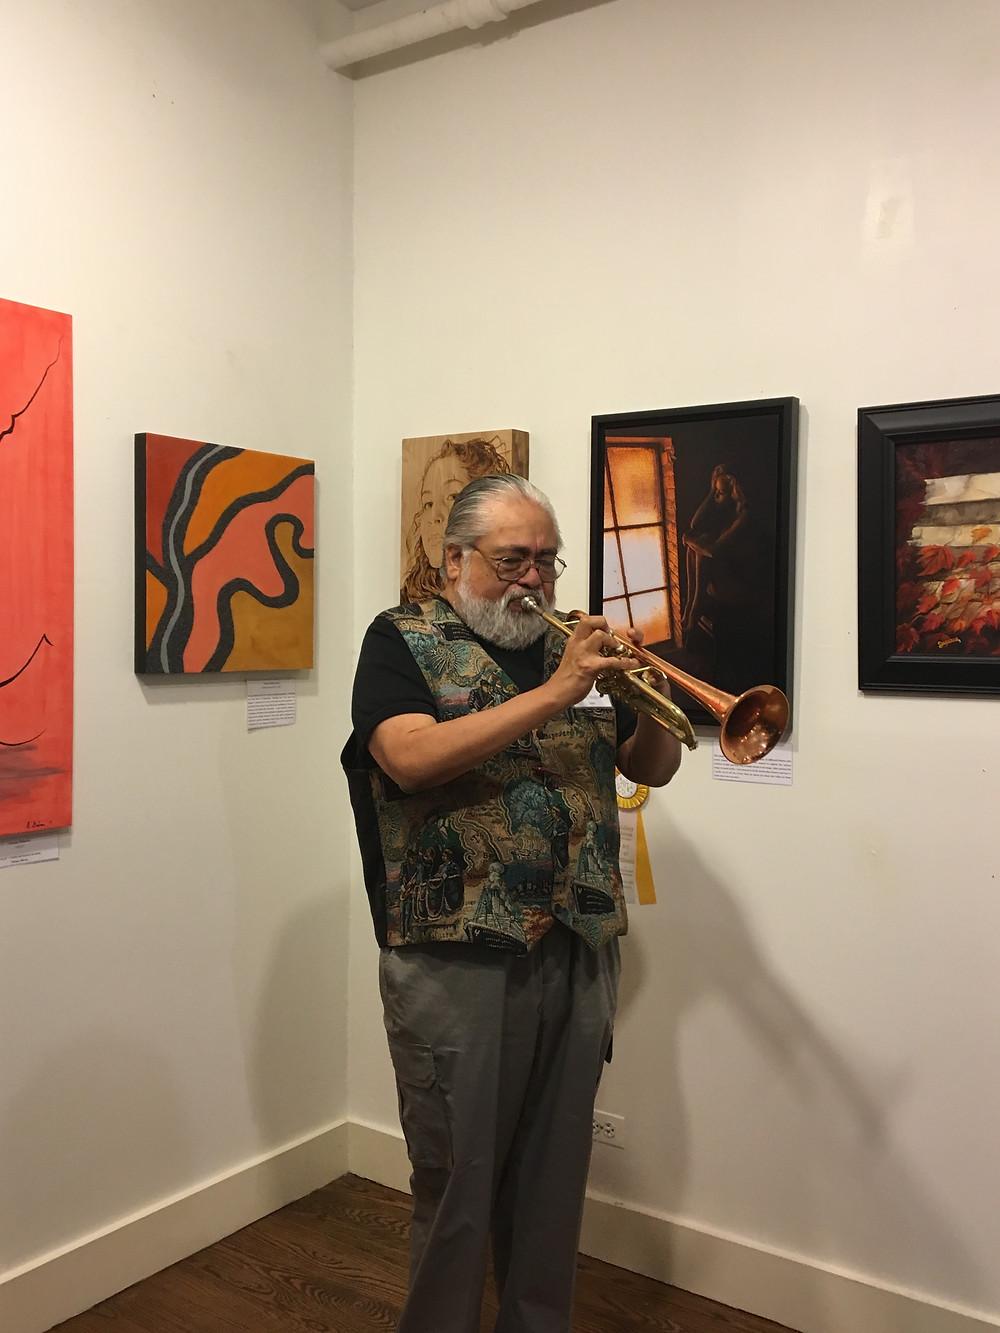 Great jazz musician